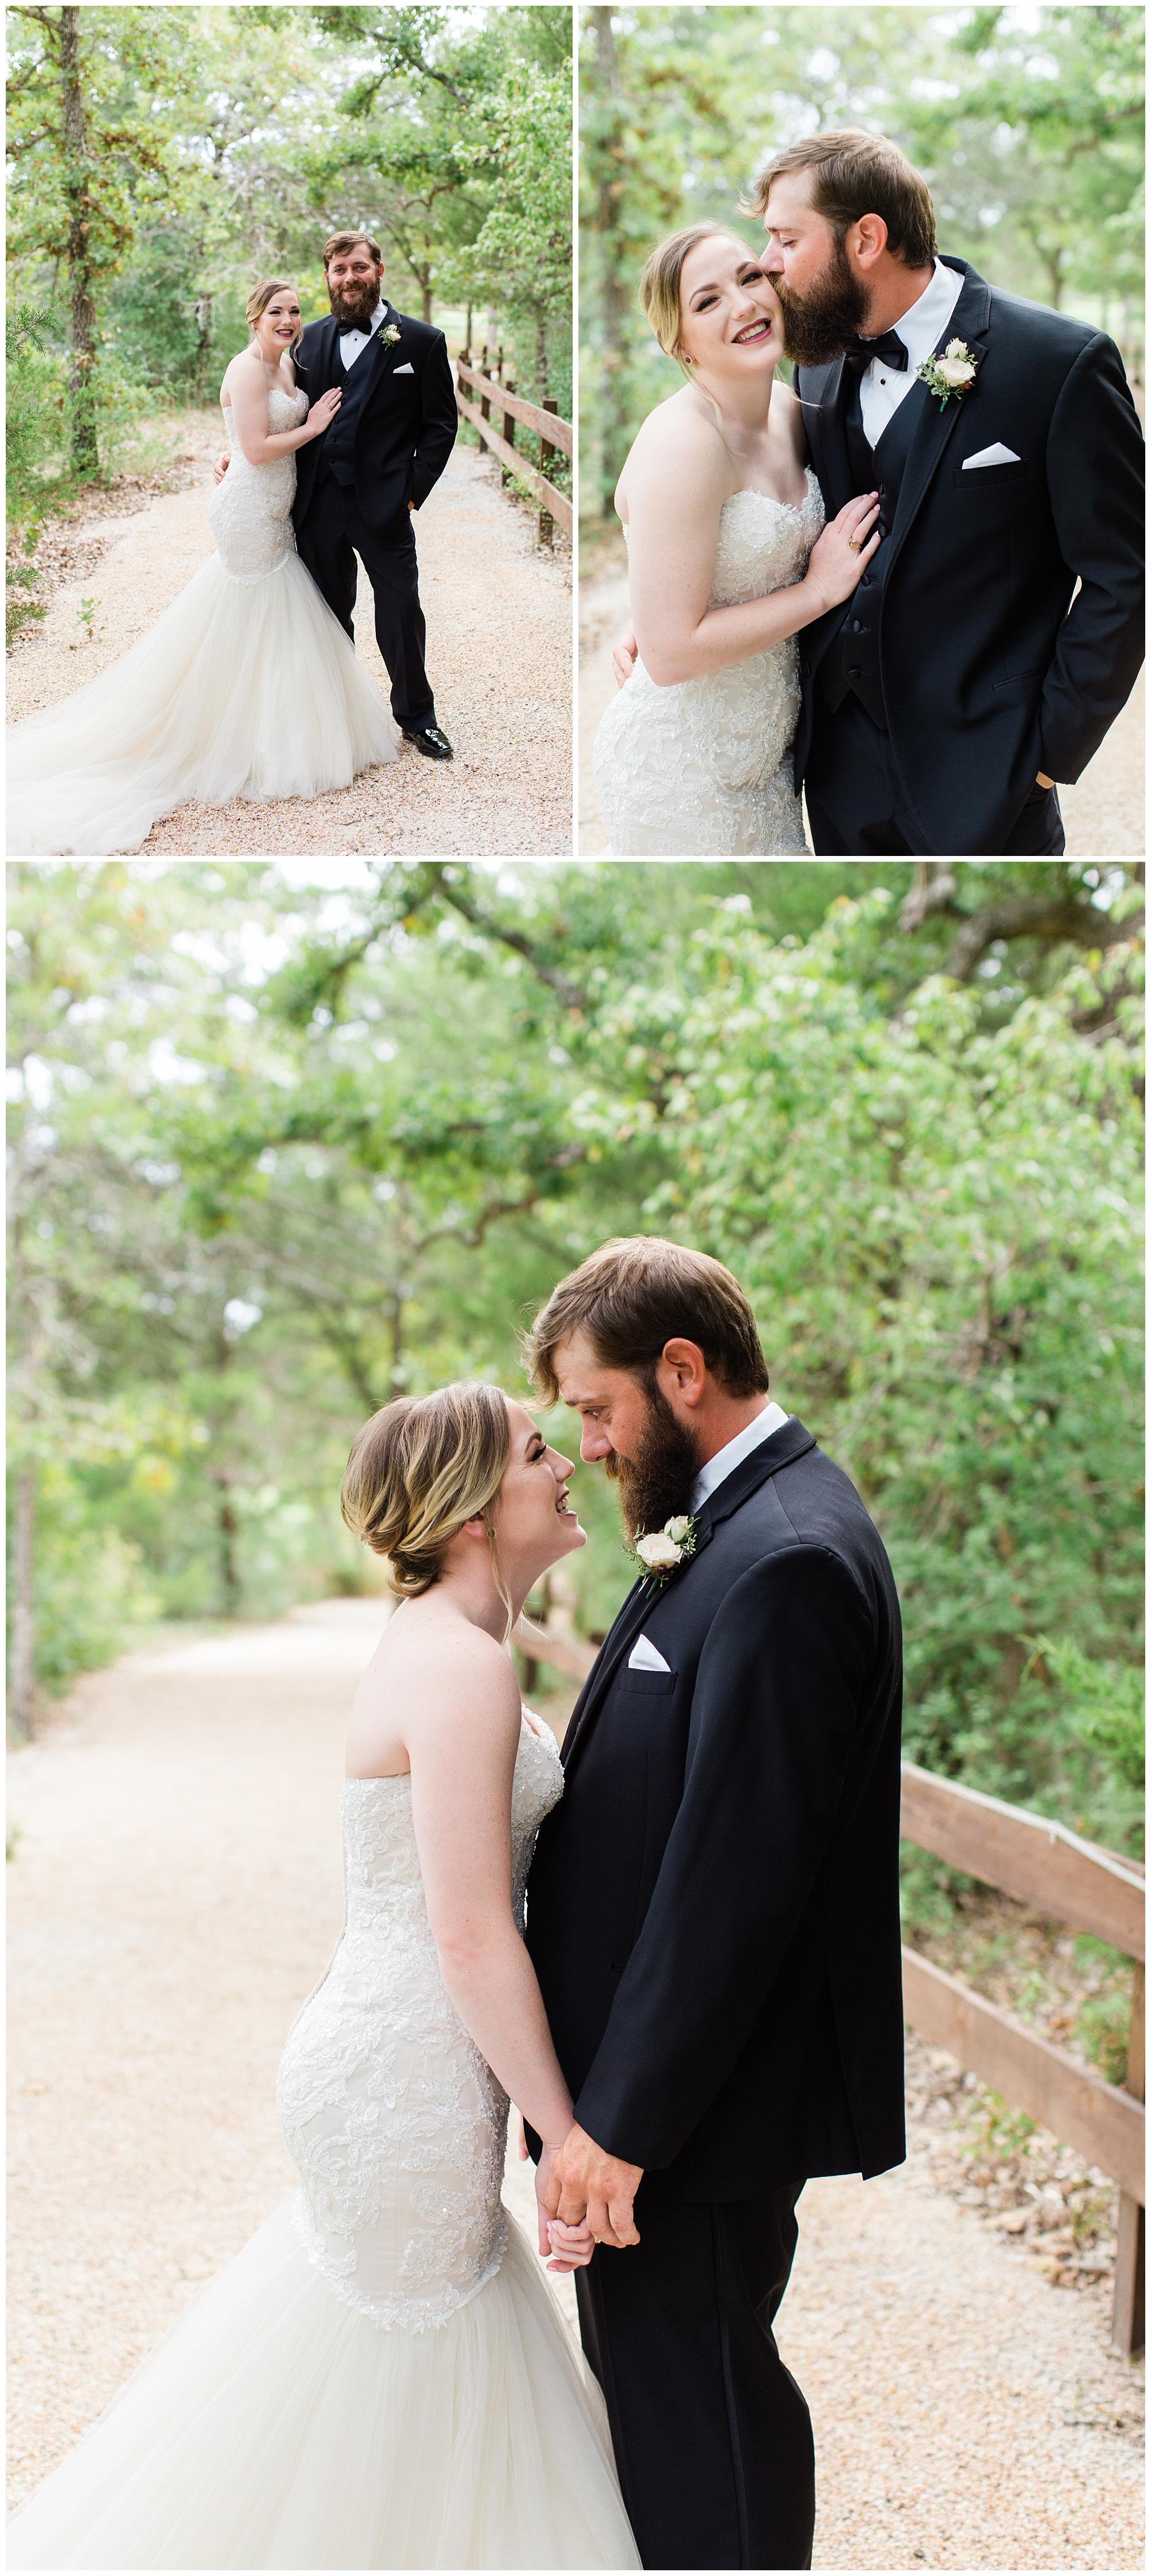 Peach_Creek_Ranch_Wedding_Kristina_Ross_Photography_0009.jpg